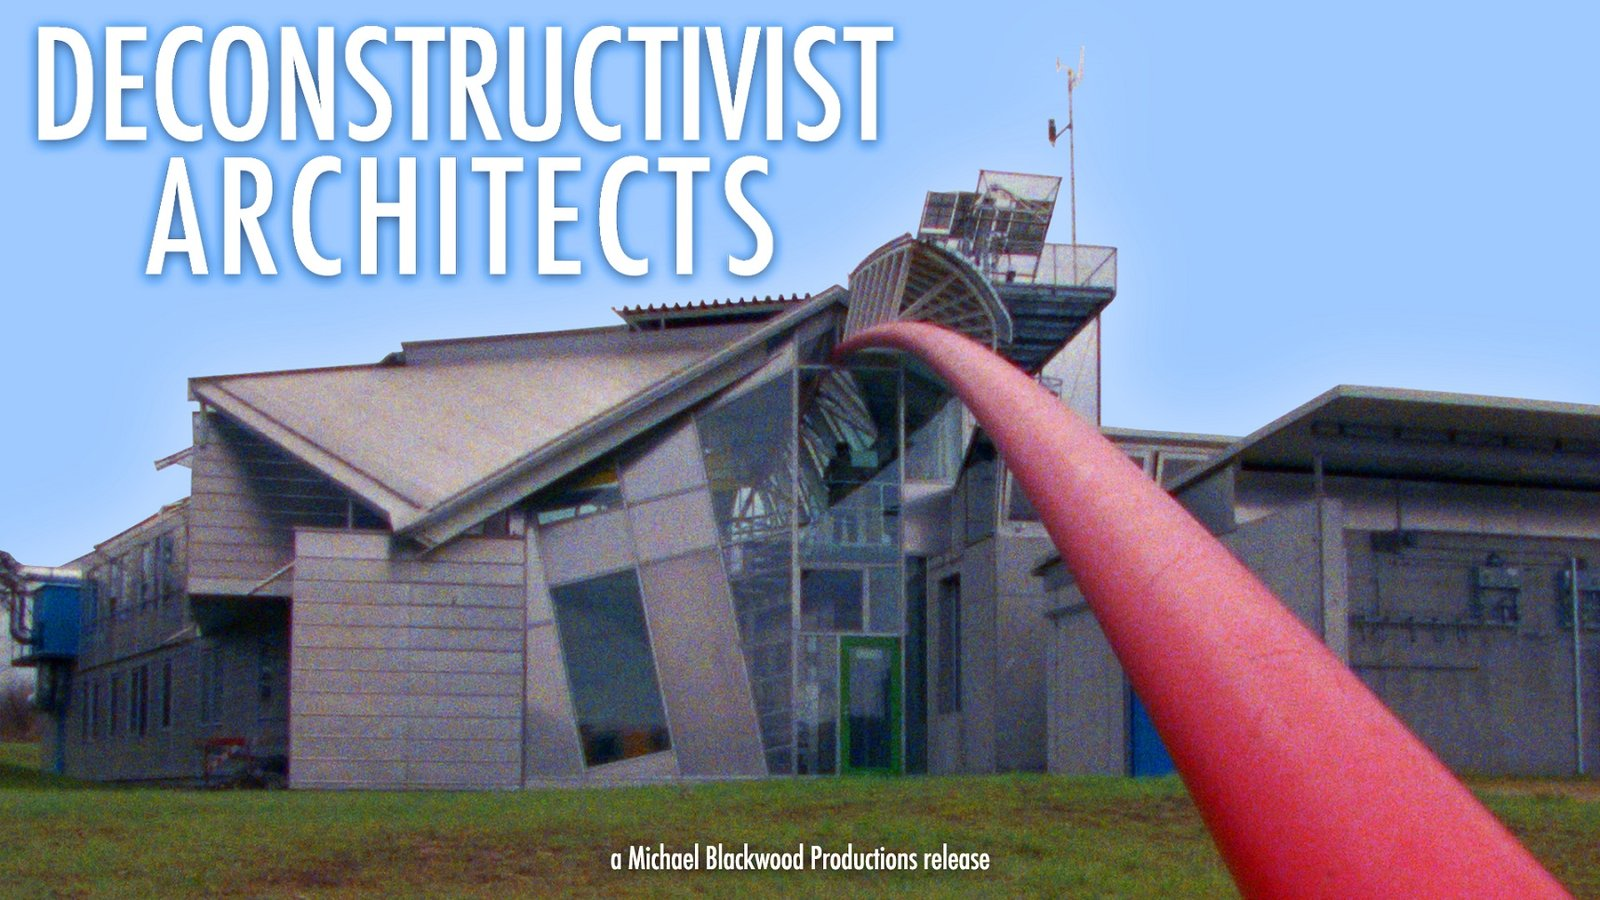 Deconstructivist Architects